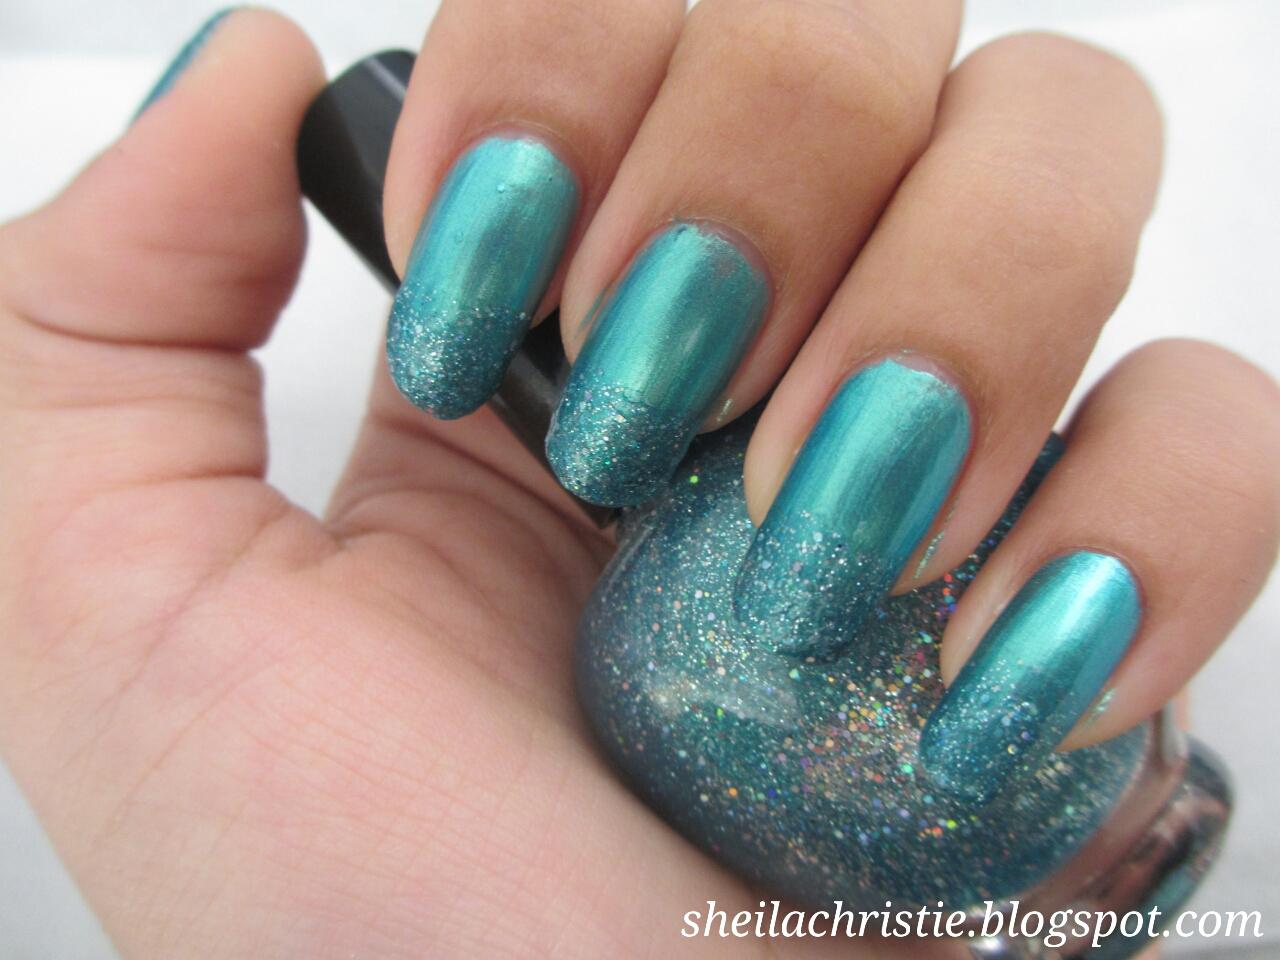 green mermaid nails french glitter manicure glamoflage. Black Bedroom Furniture Sets. Home Design Ideas